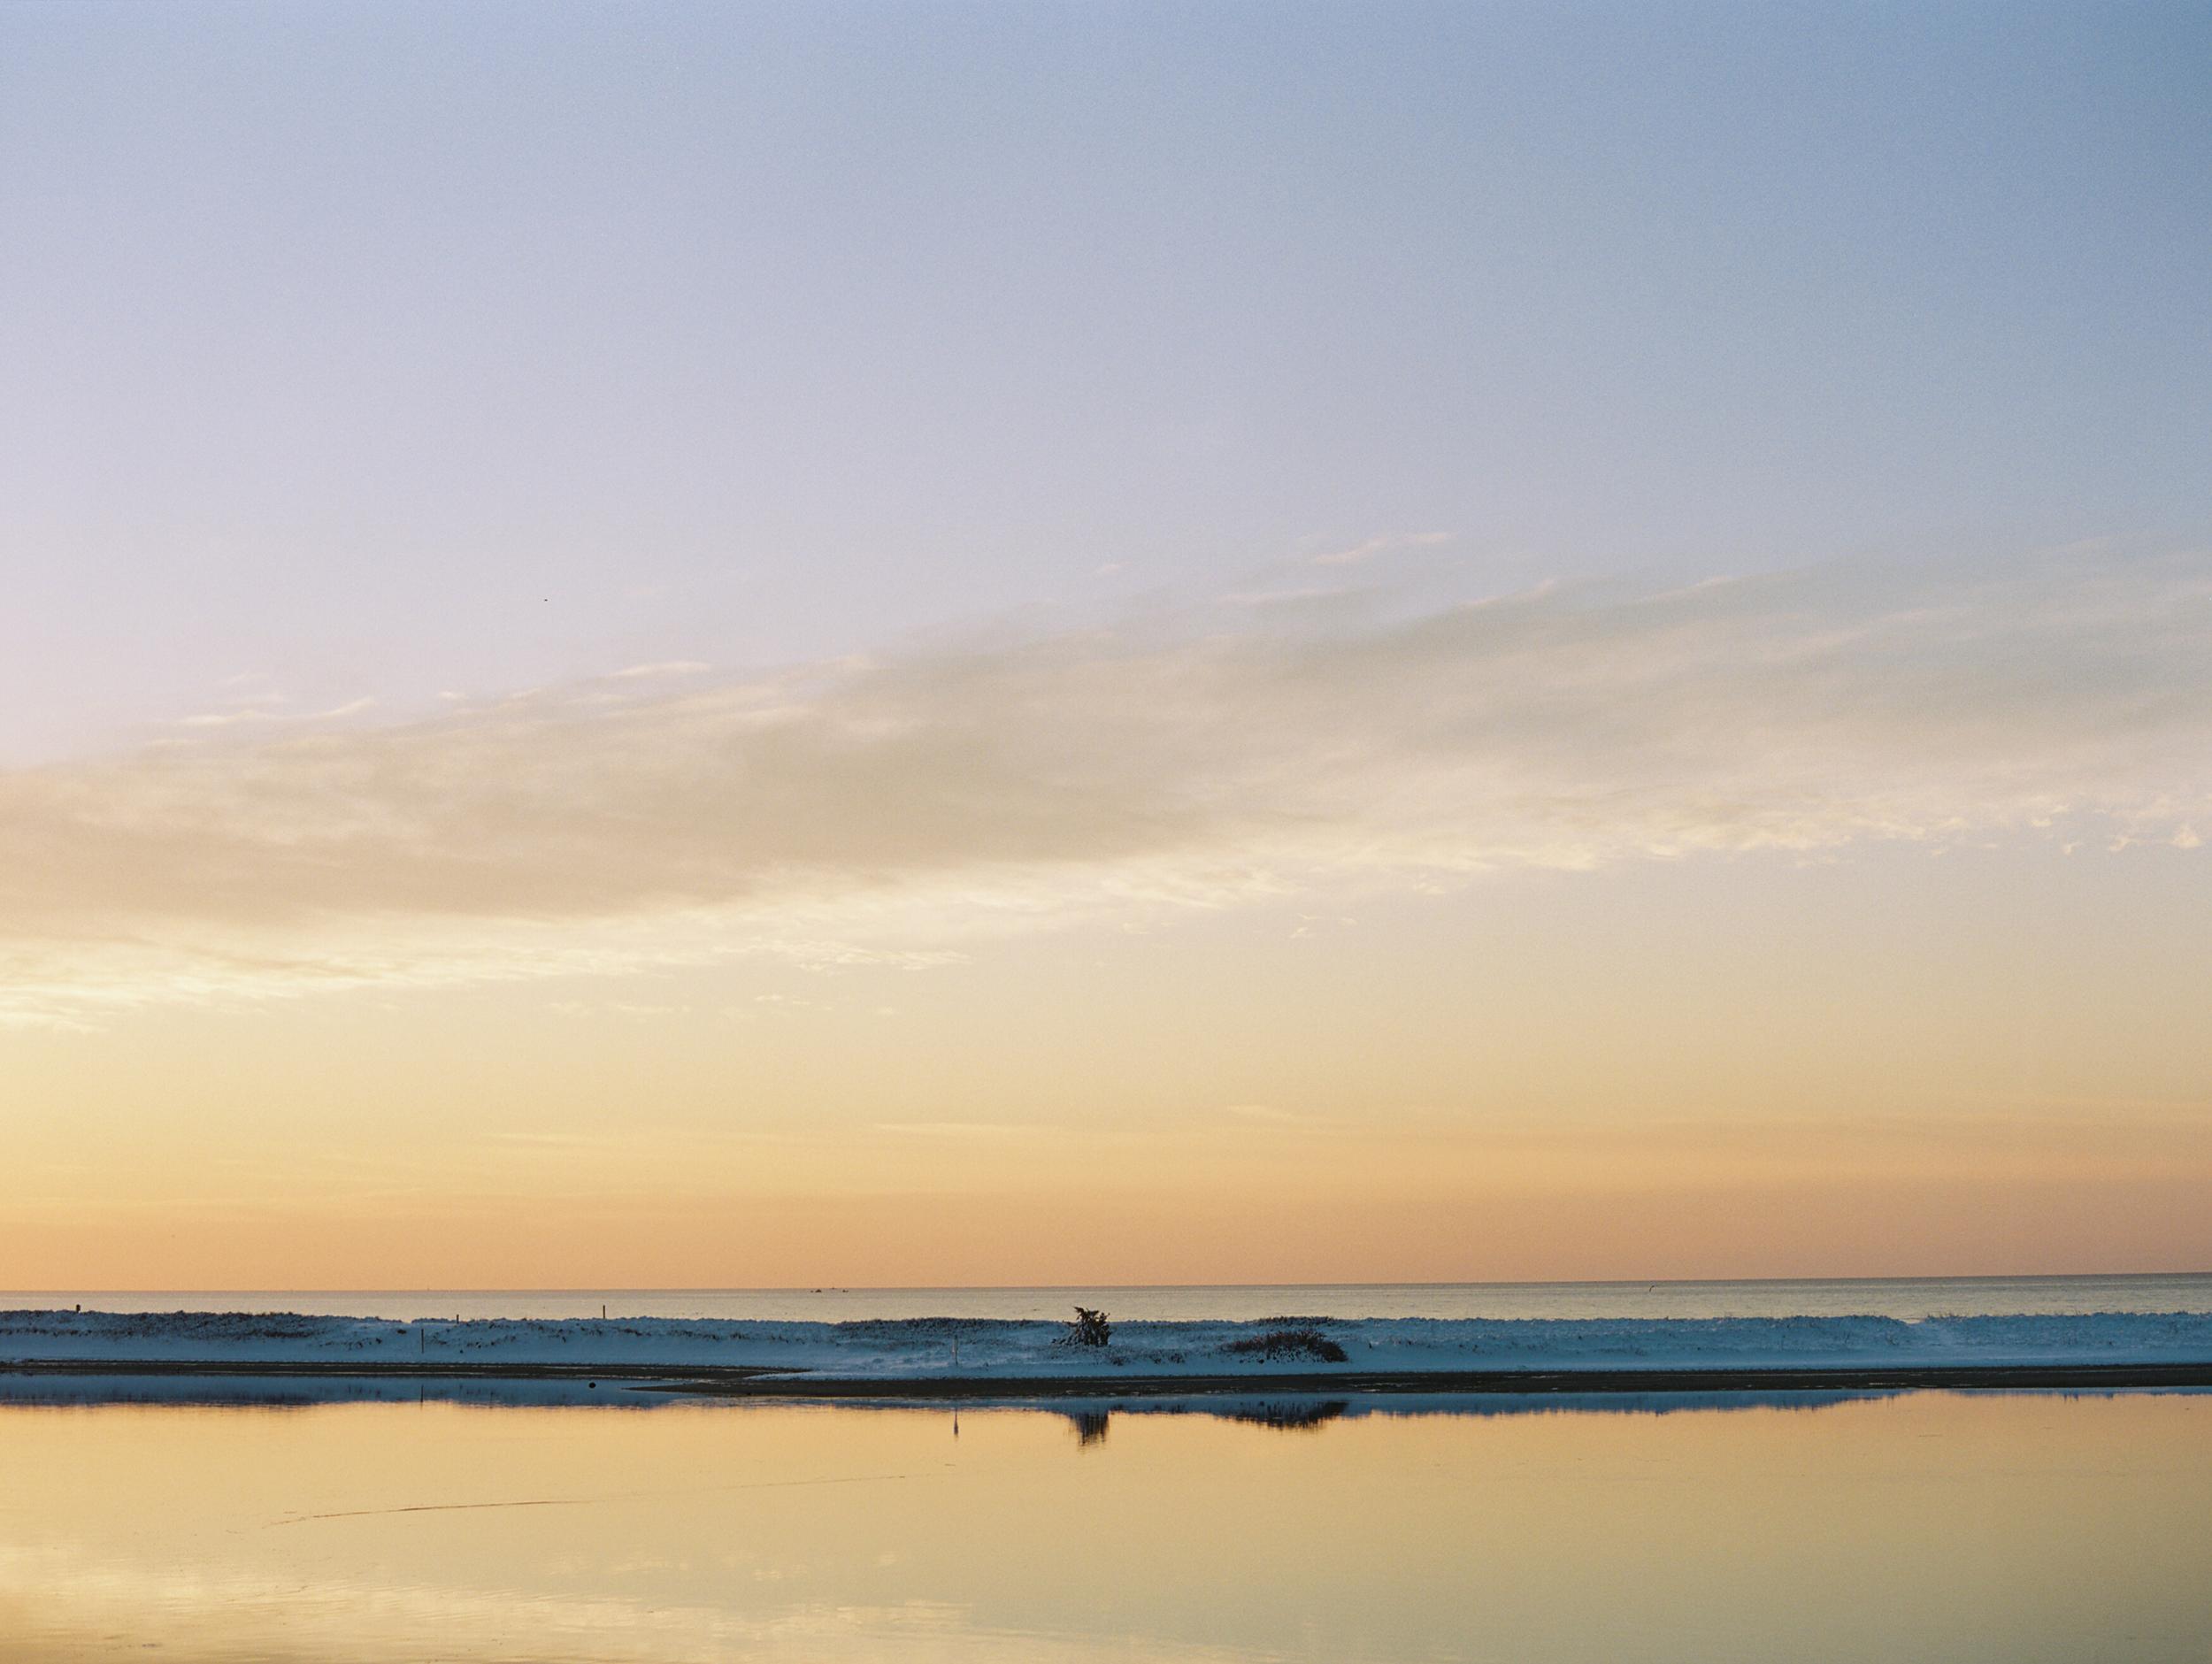 013-fine-art-photography-le-petite-peach-cape-cod-brumley & wells.jpg